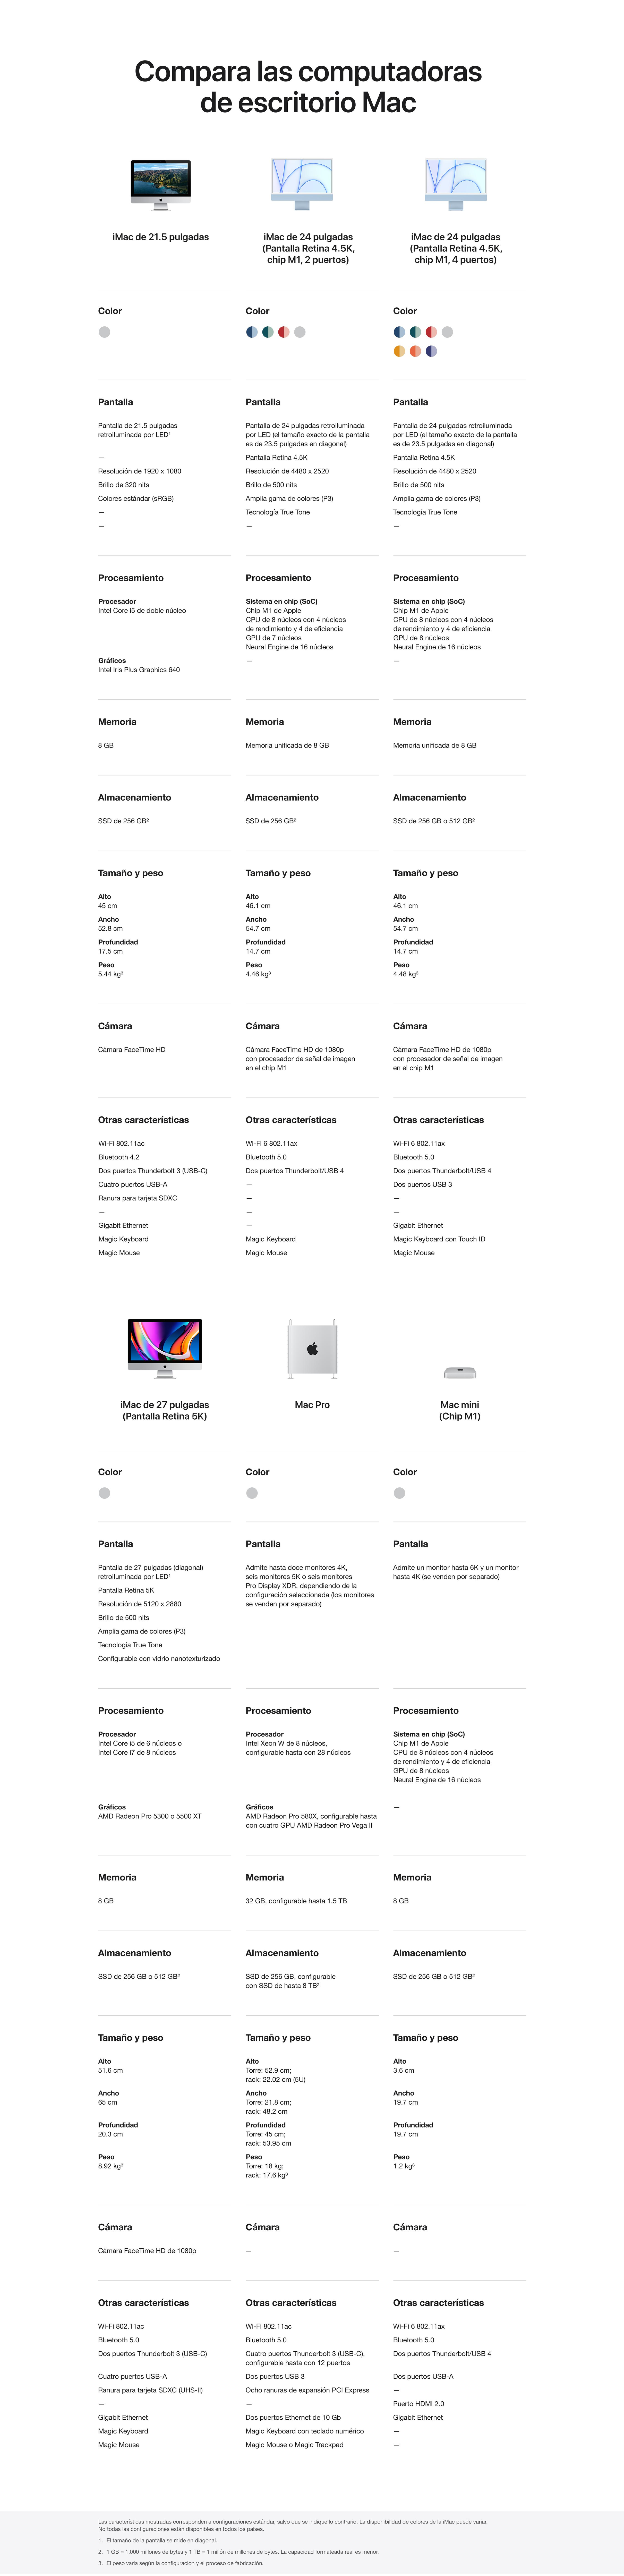 comparativa Mac